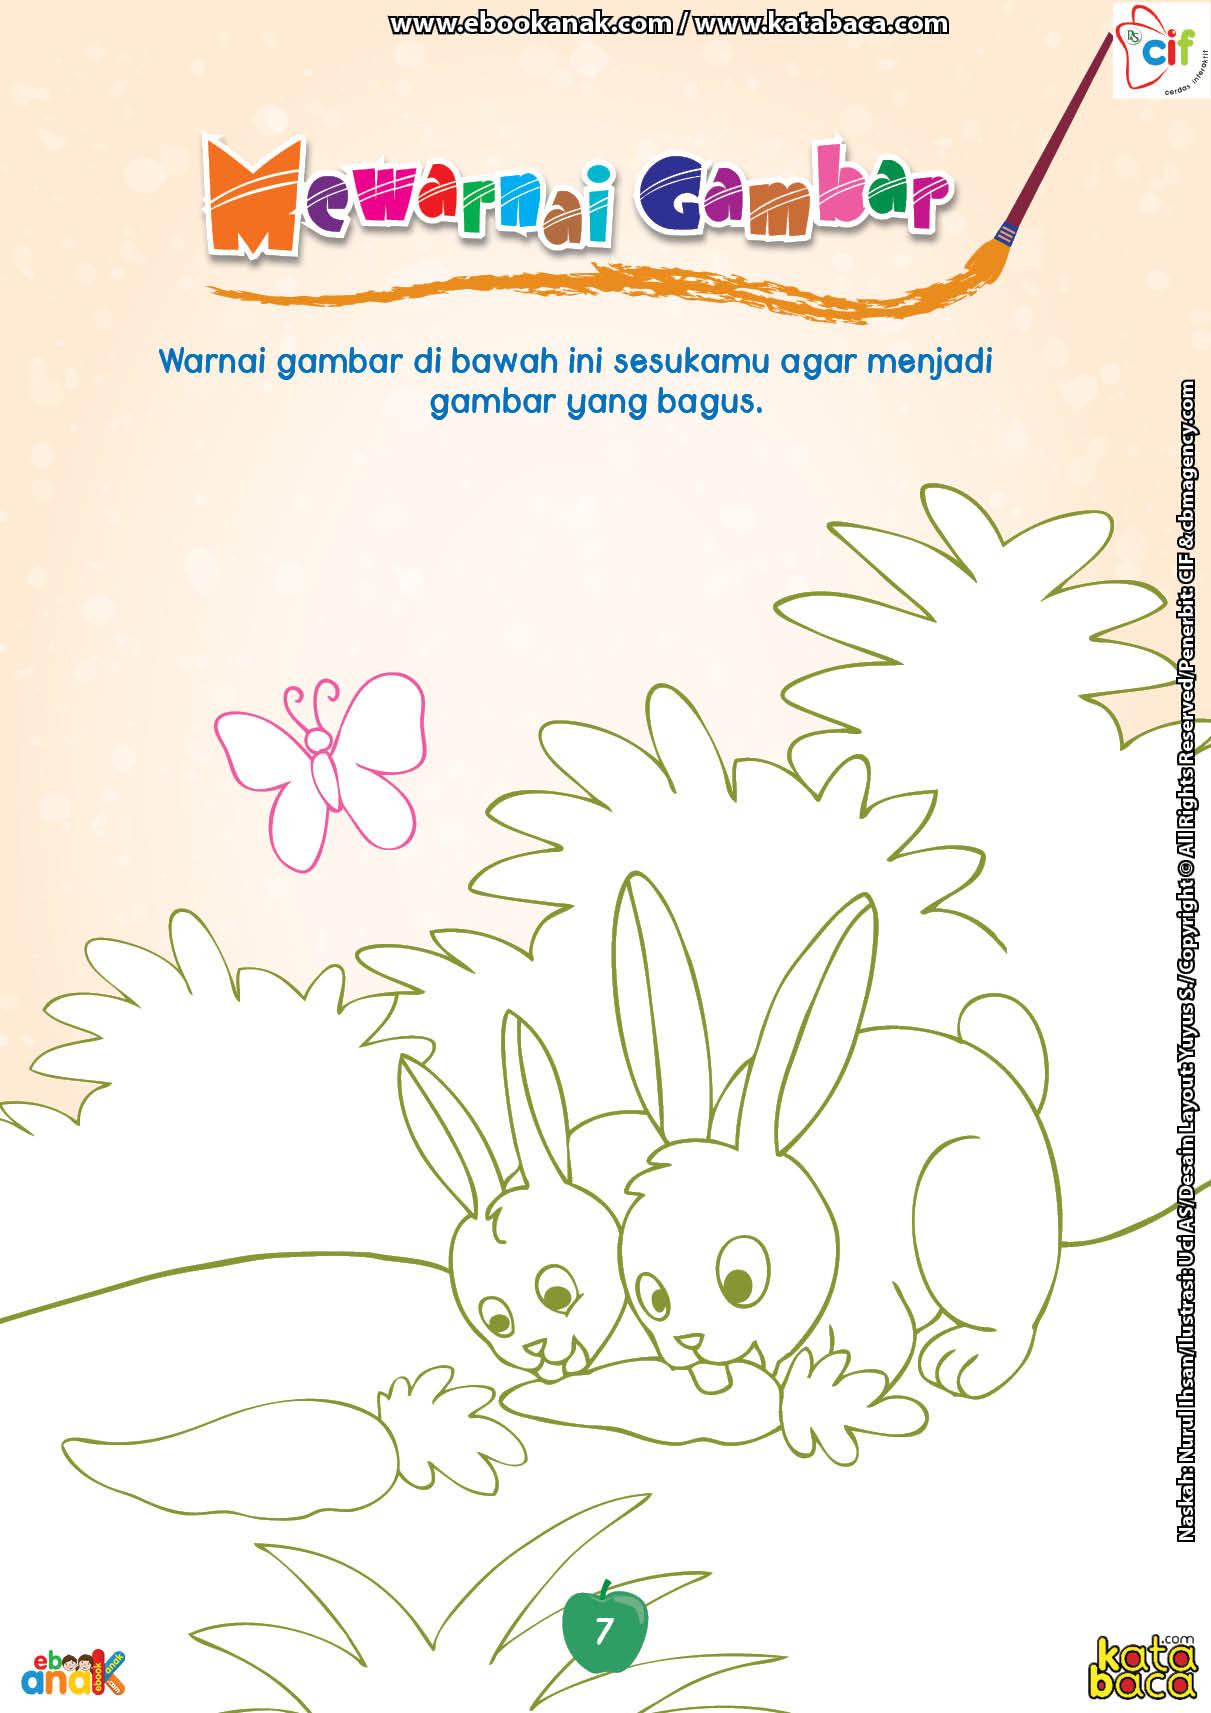 Mewarnai Gambar Dua Ekor Kelinci Yang Sedang Makan Wortel